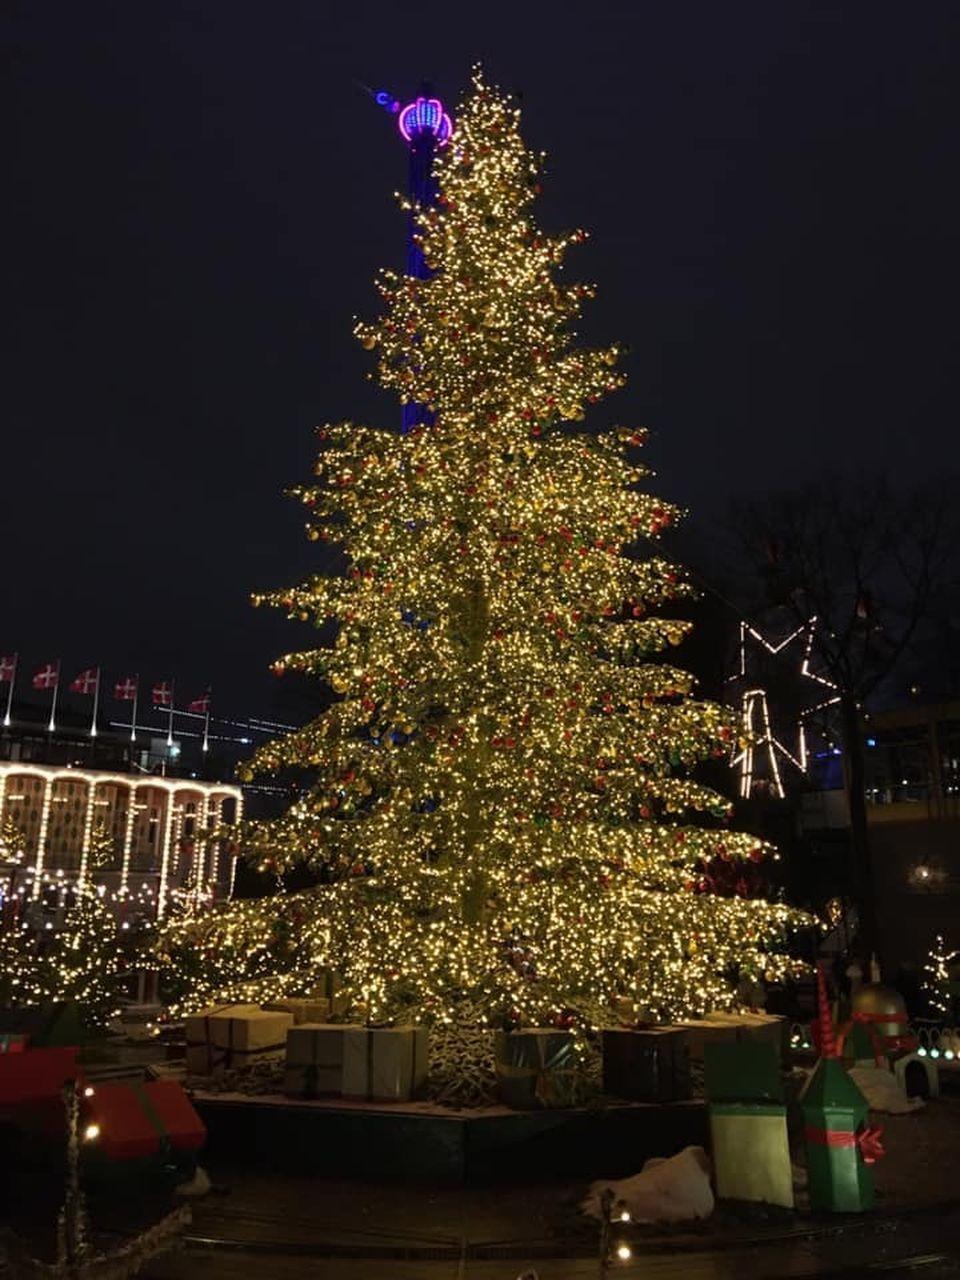 ILLUMINATED CHRISTMAS TREE AGAINST SKY AT NIGHT DURING AUTUMN